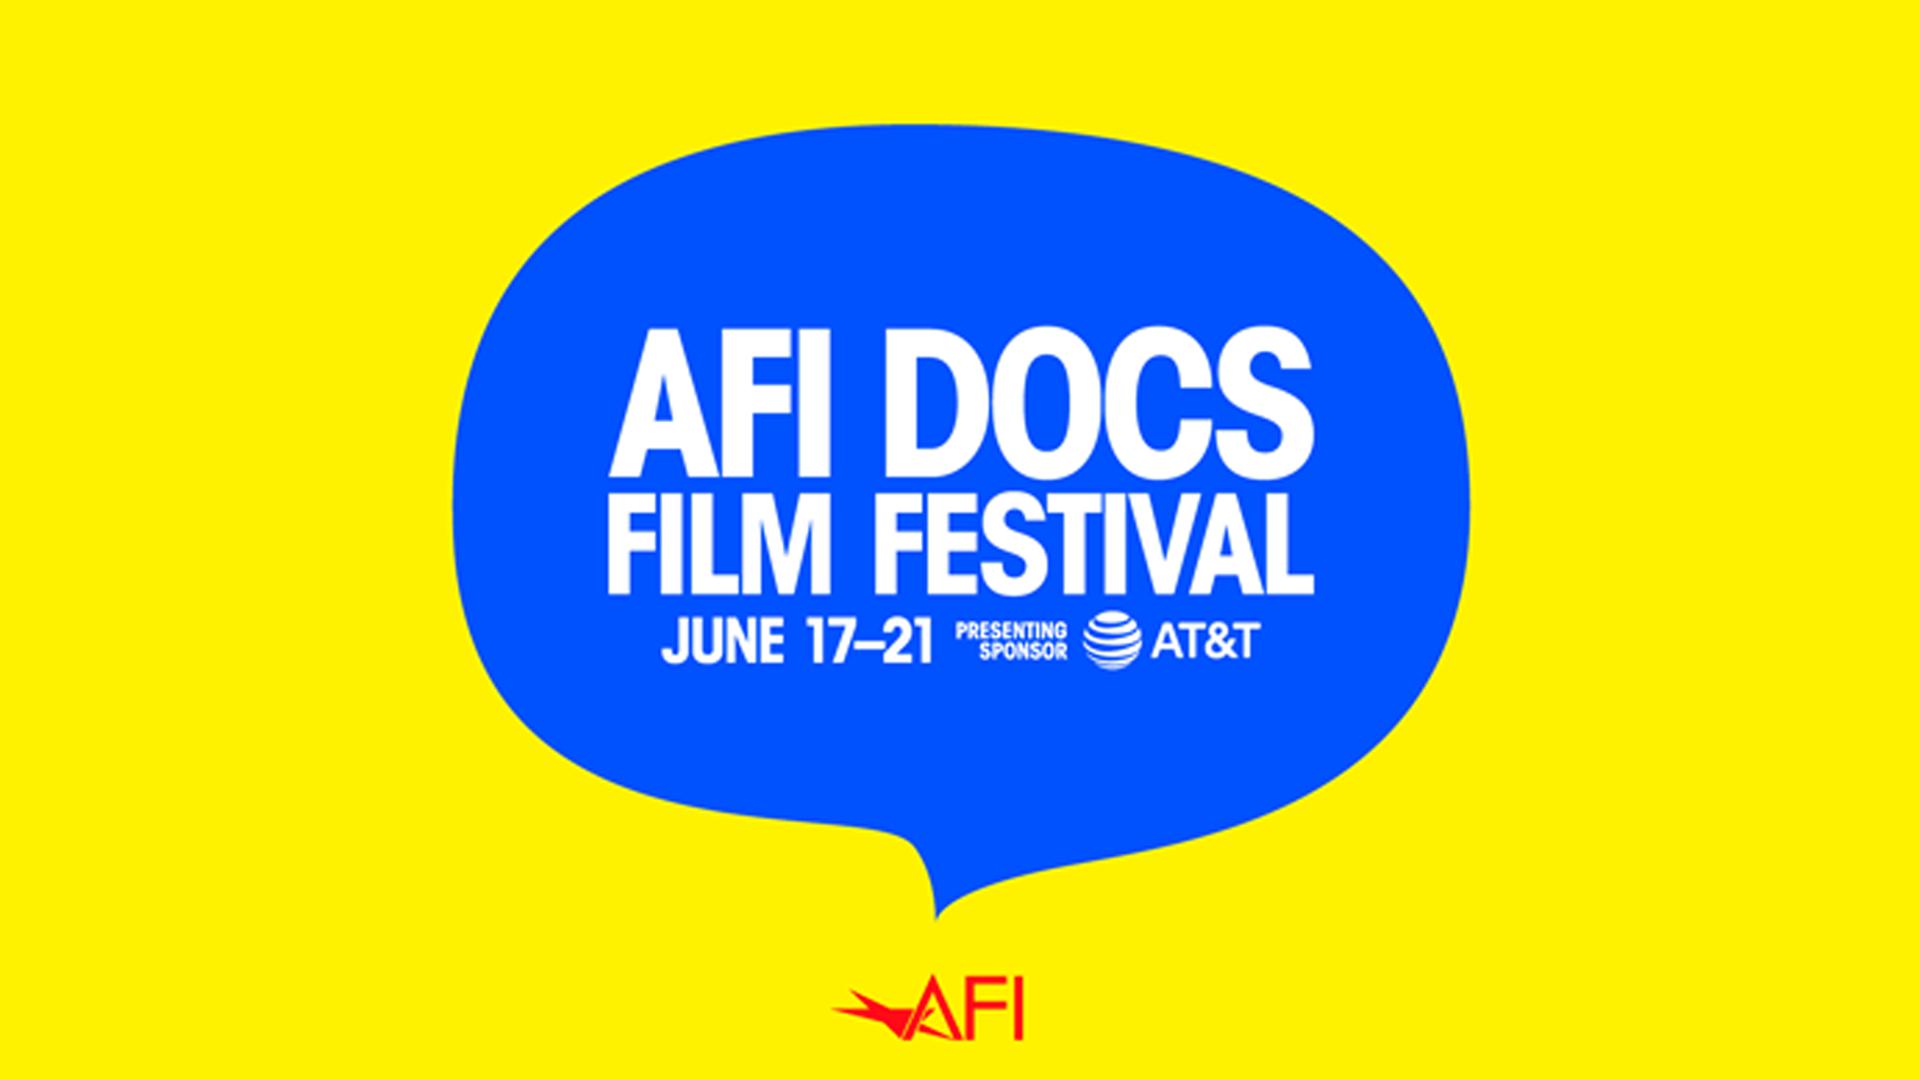 Image of the AFI Docs 2020 Film Festival logo